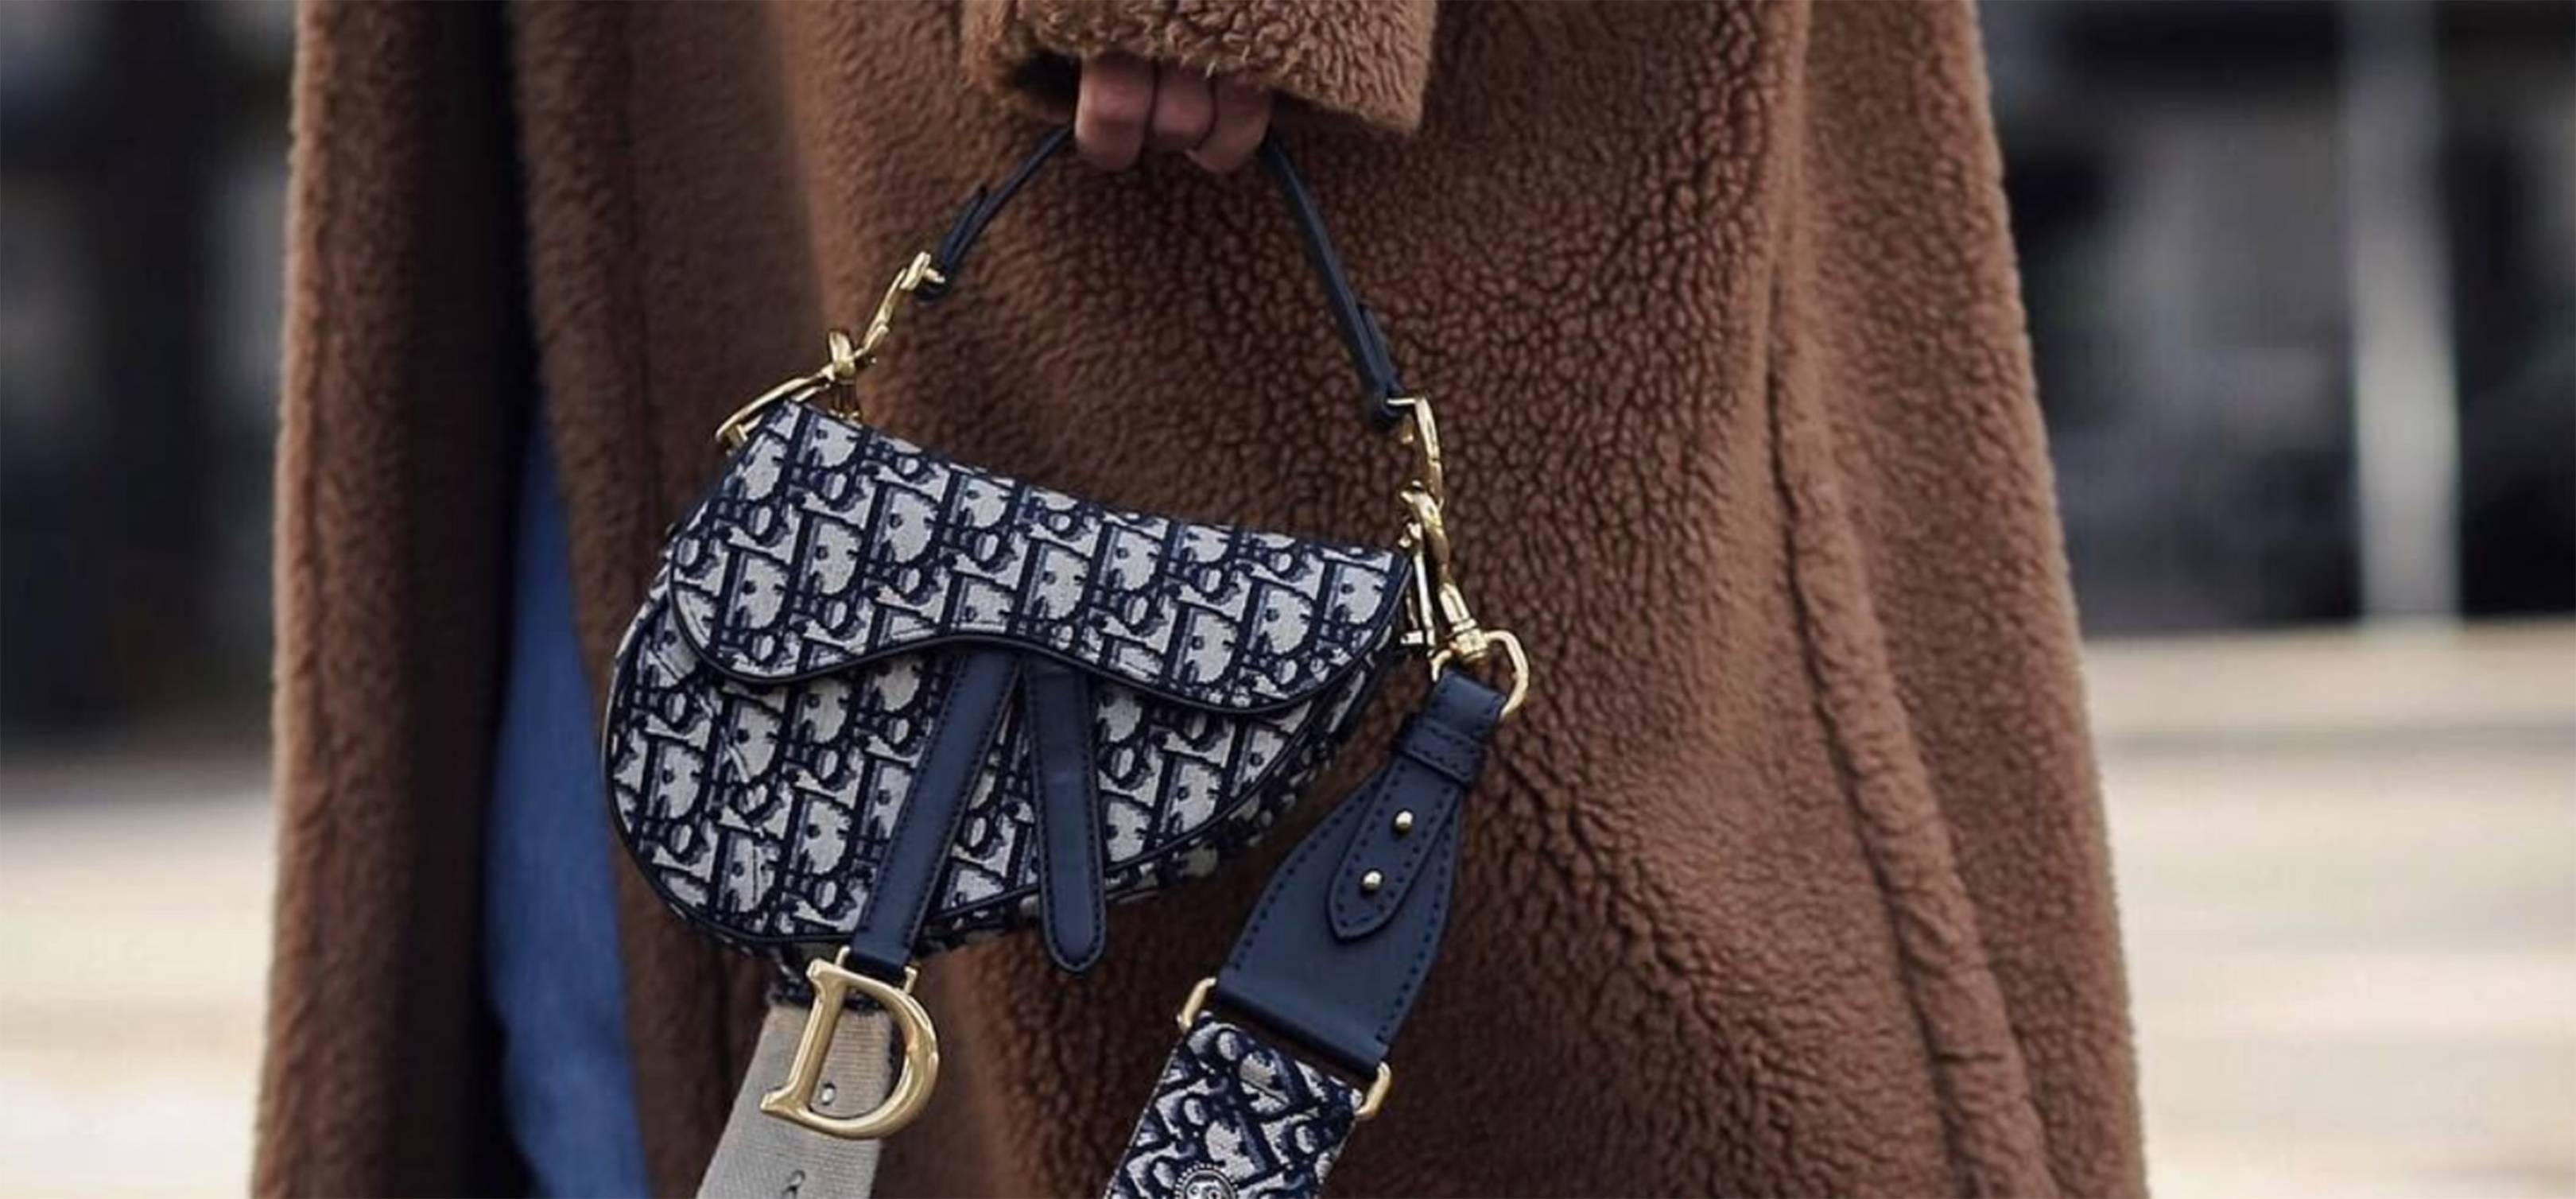 Dior Saddle Bag  Officially 2018 s Most Popular Handbag  412bdd075dfcb